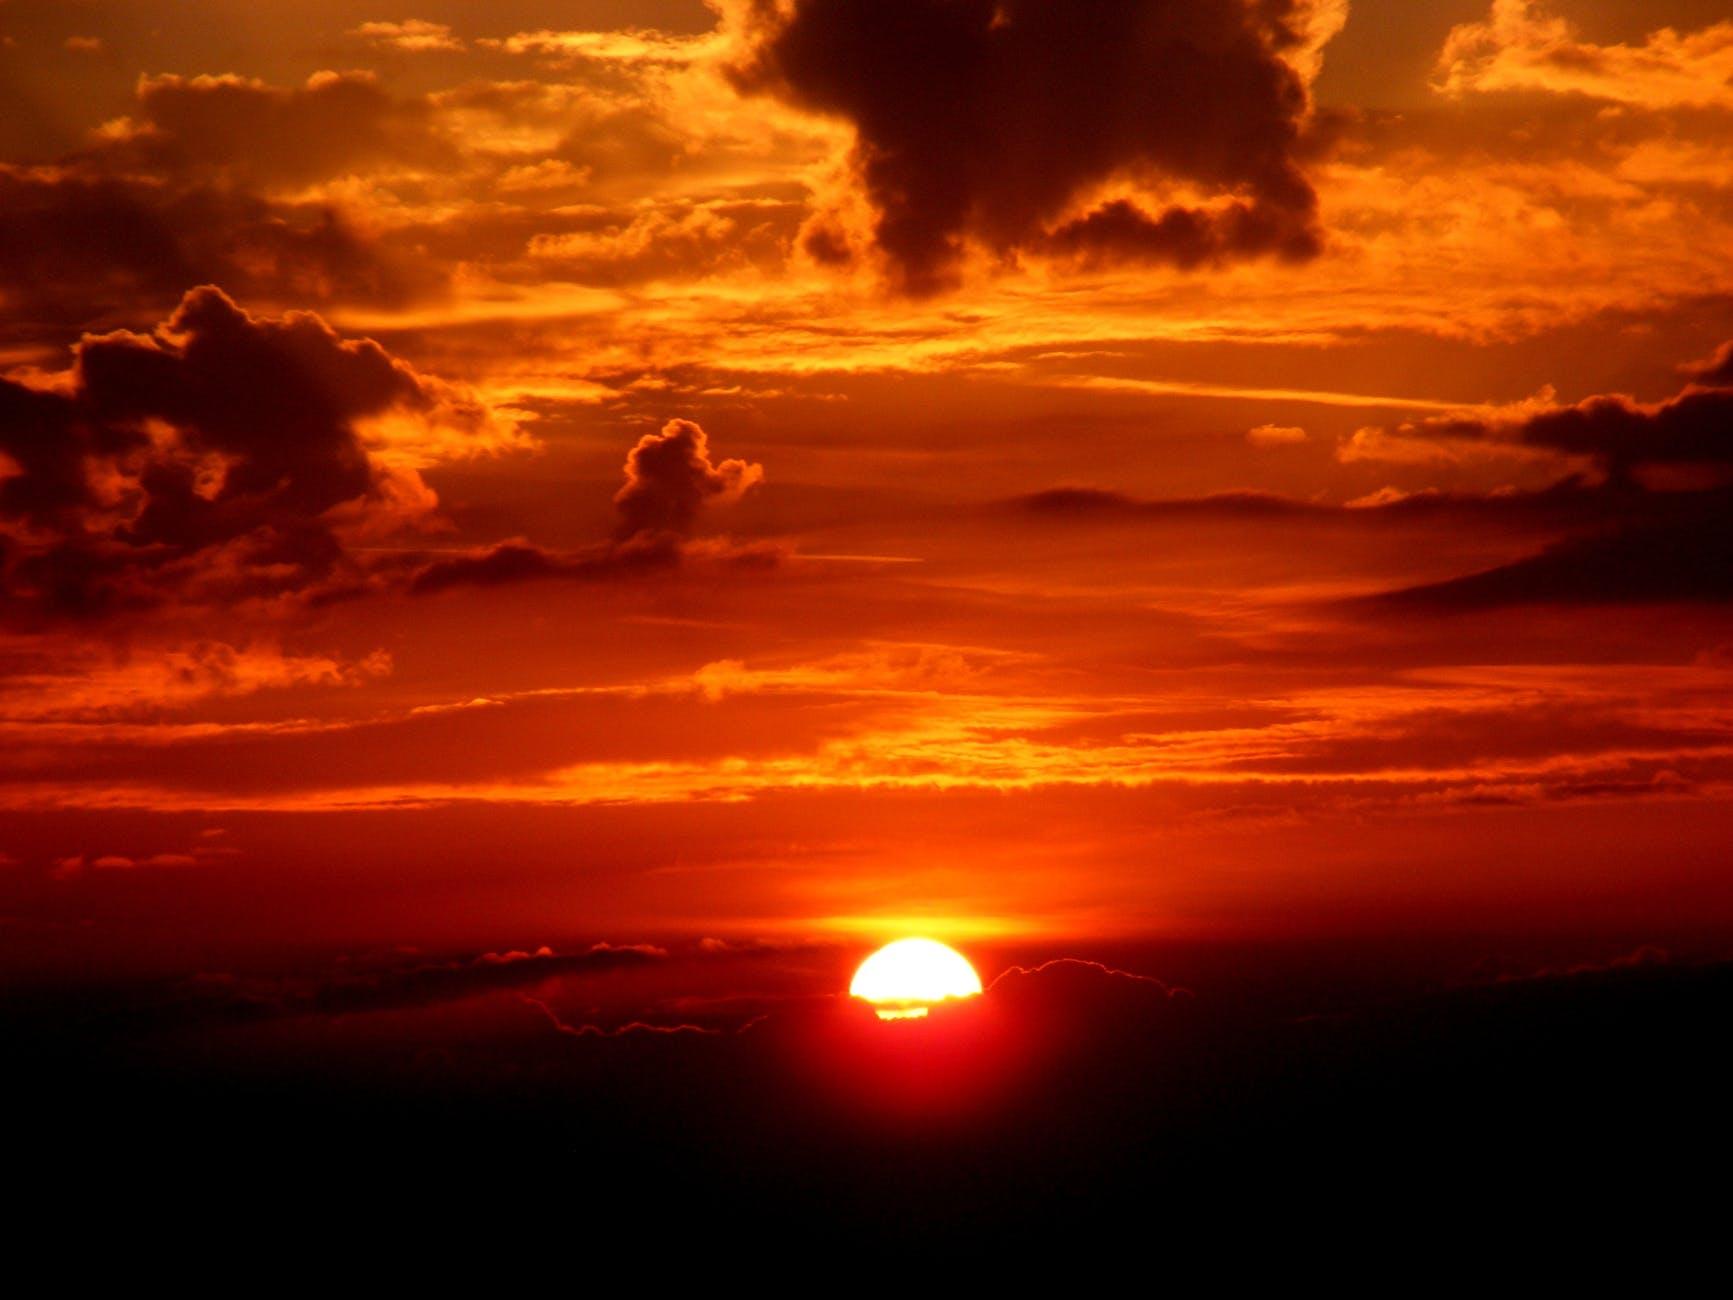 Landscape Sunset Image